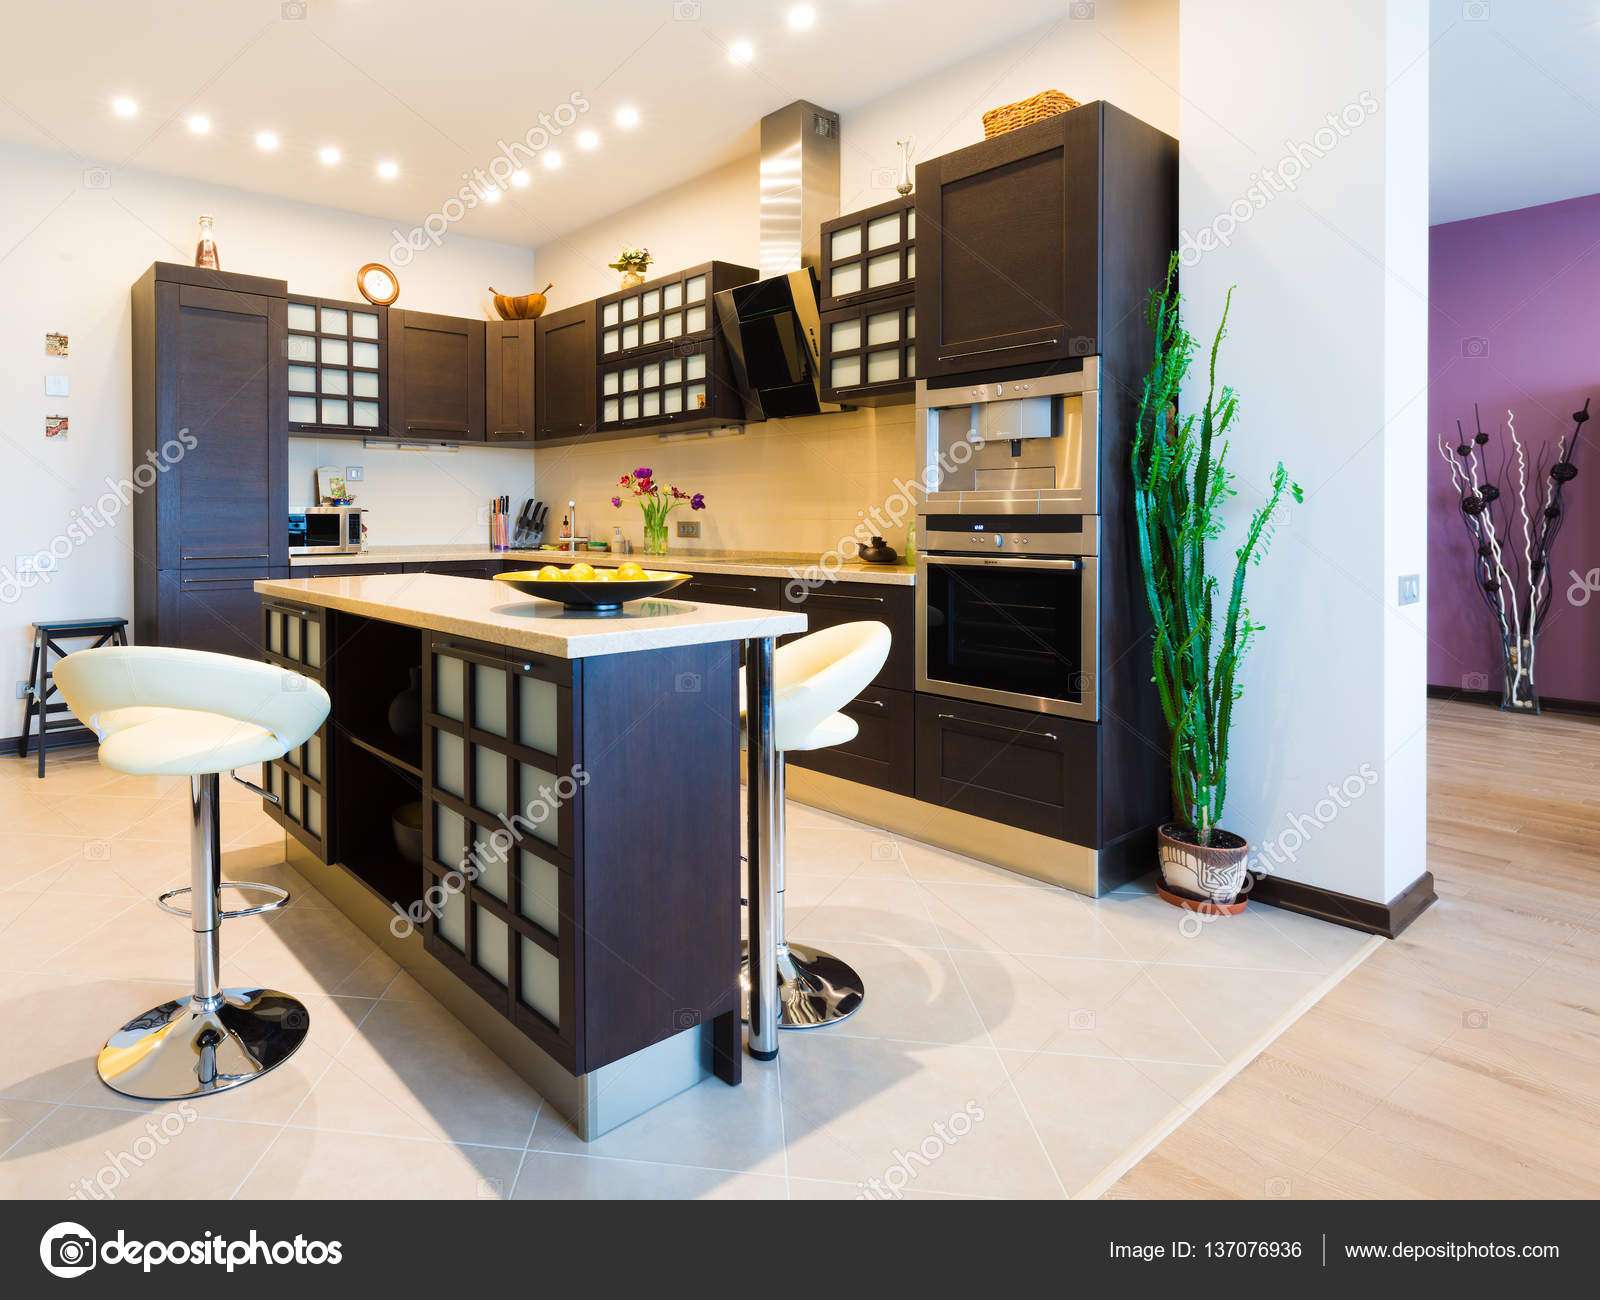 Elegante cucina con sala da pranzo in stile moderno — Foto Stock ...